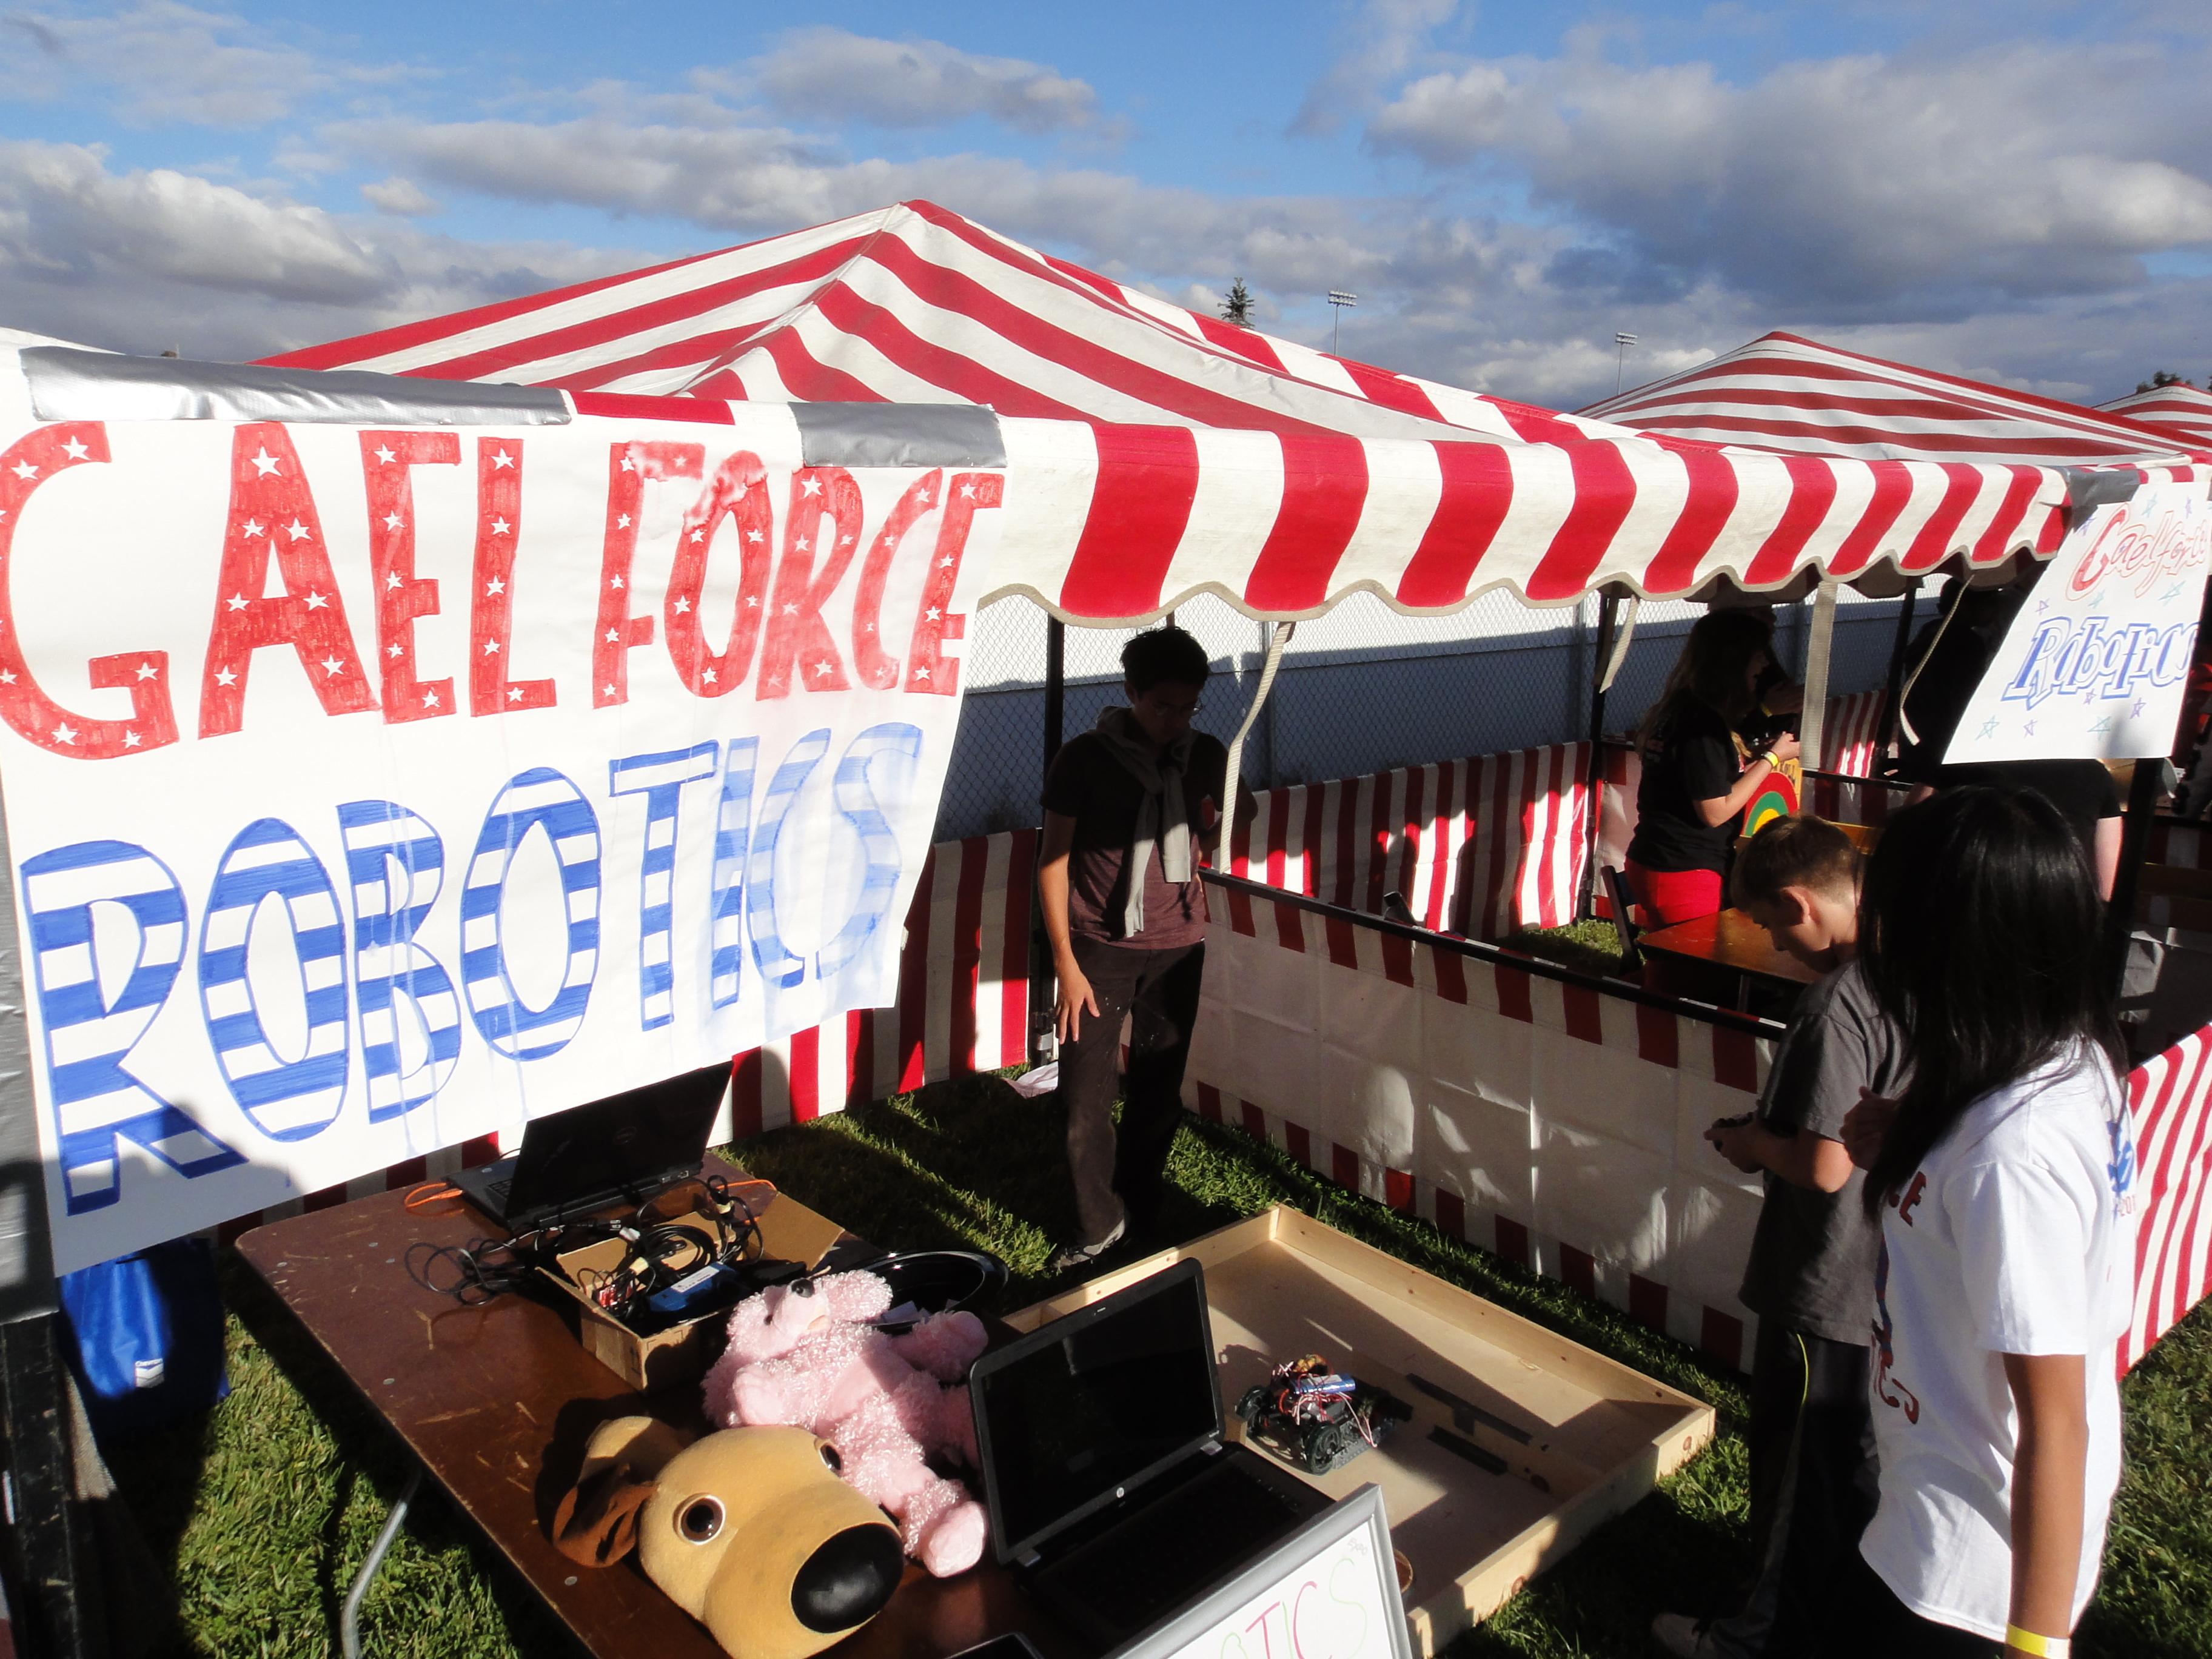 dublin high school homecoming skit rally 2012 a